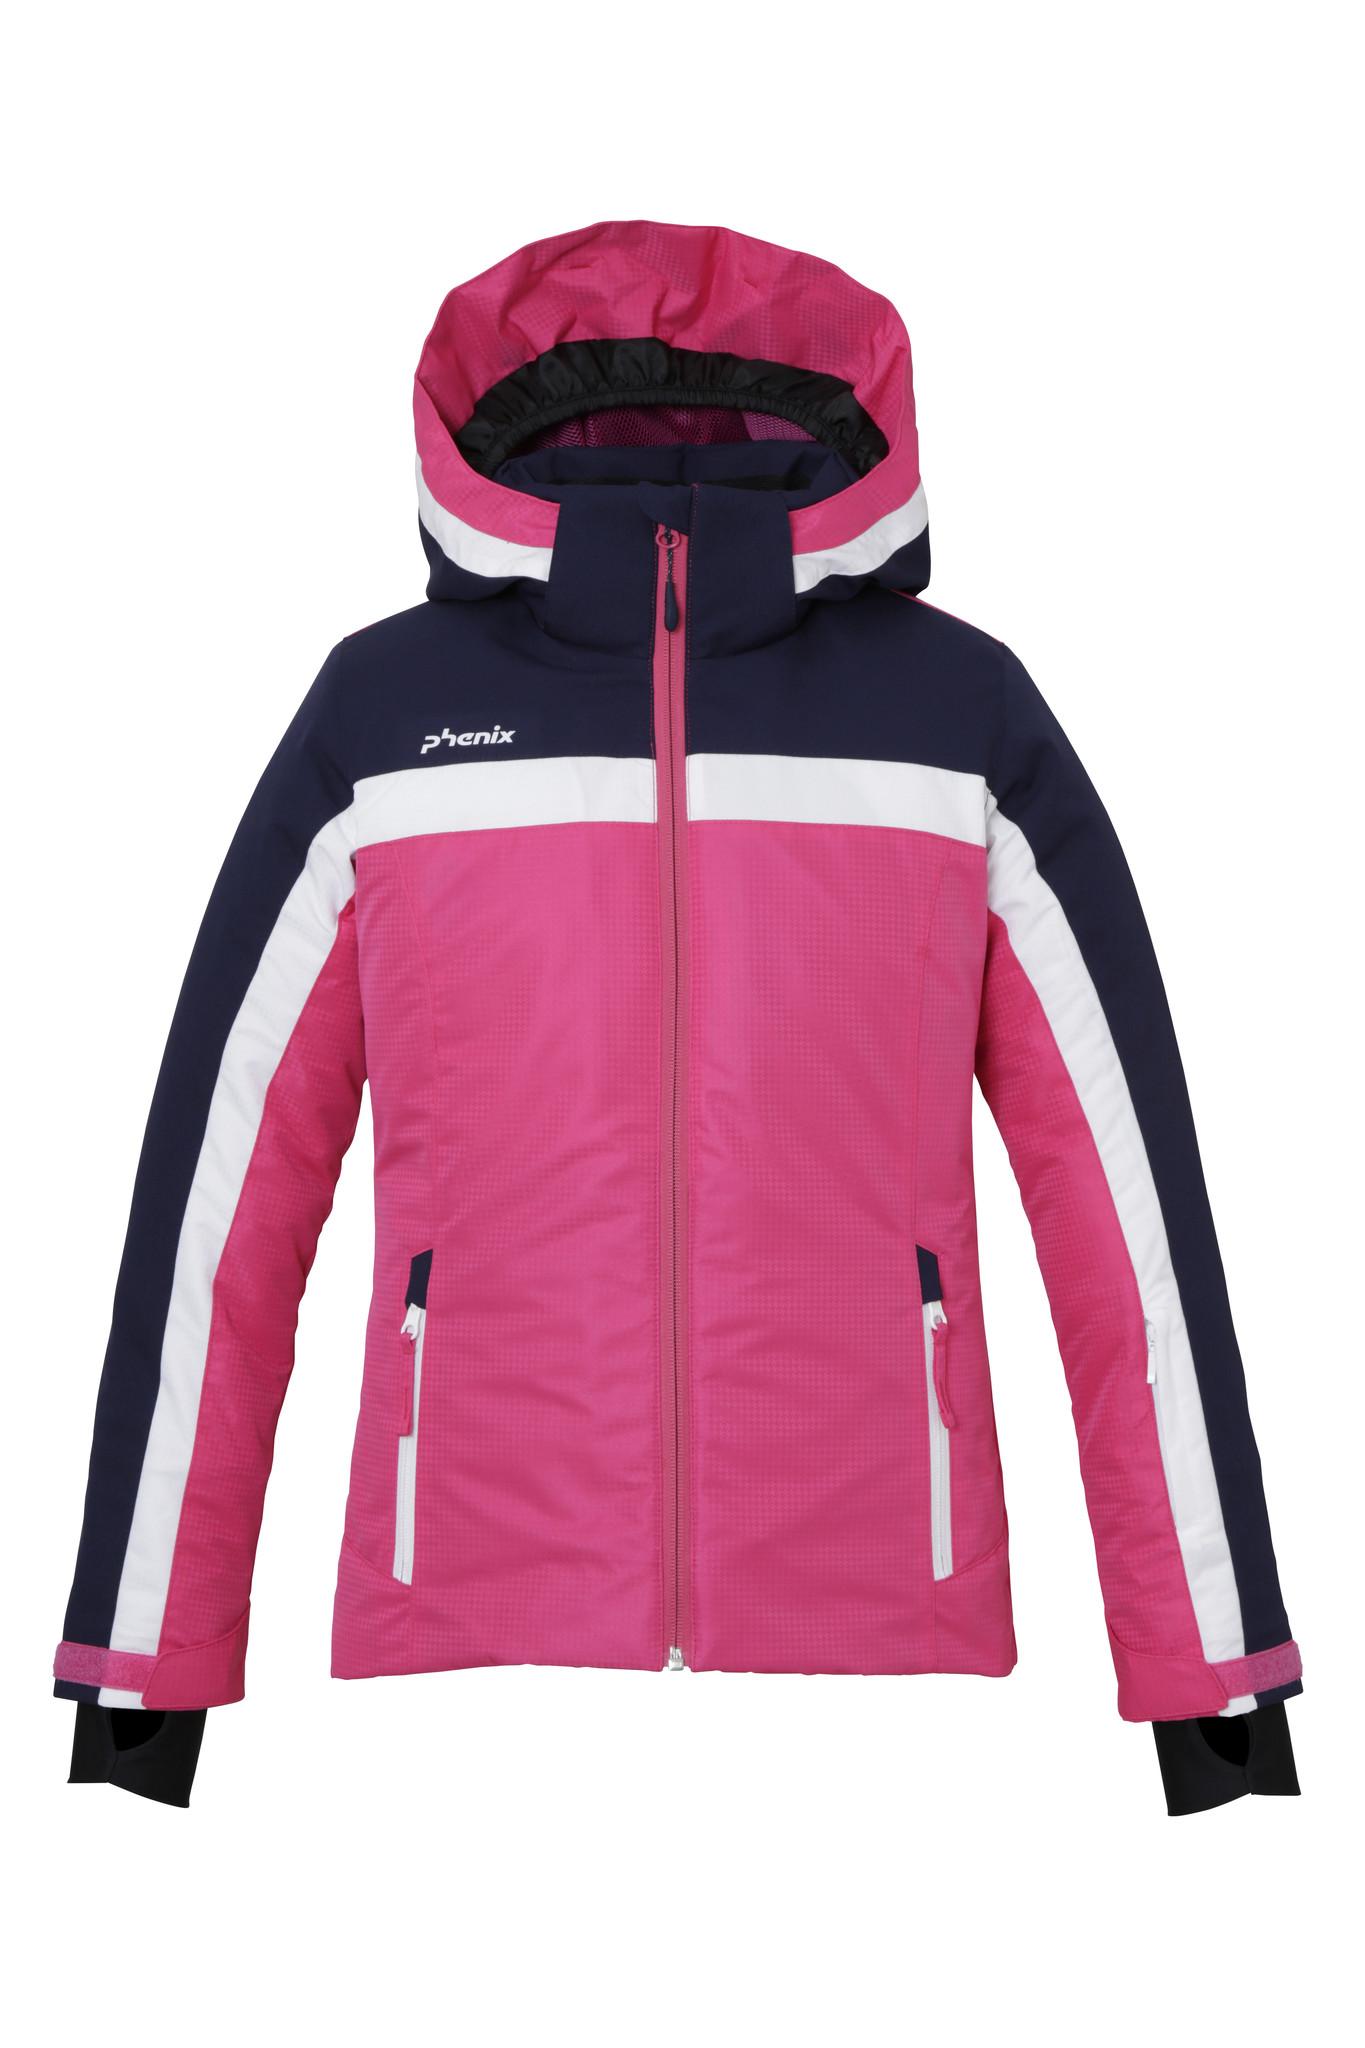 PHENIX Cancer Junior Jacket